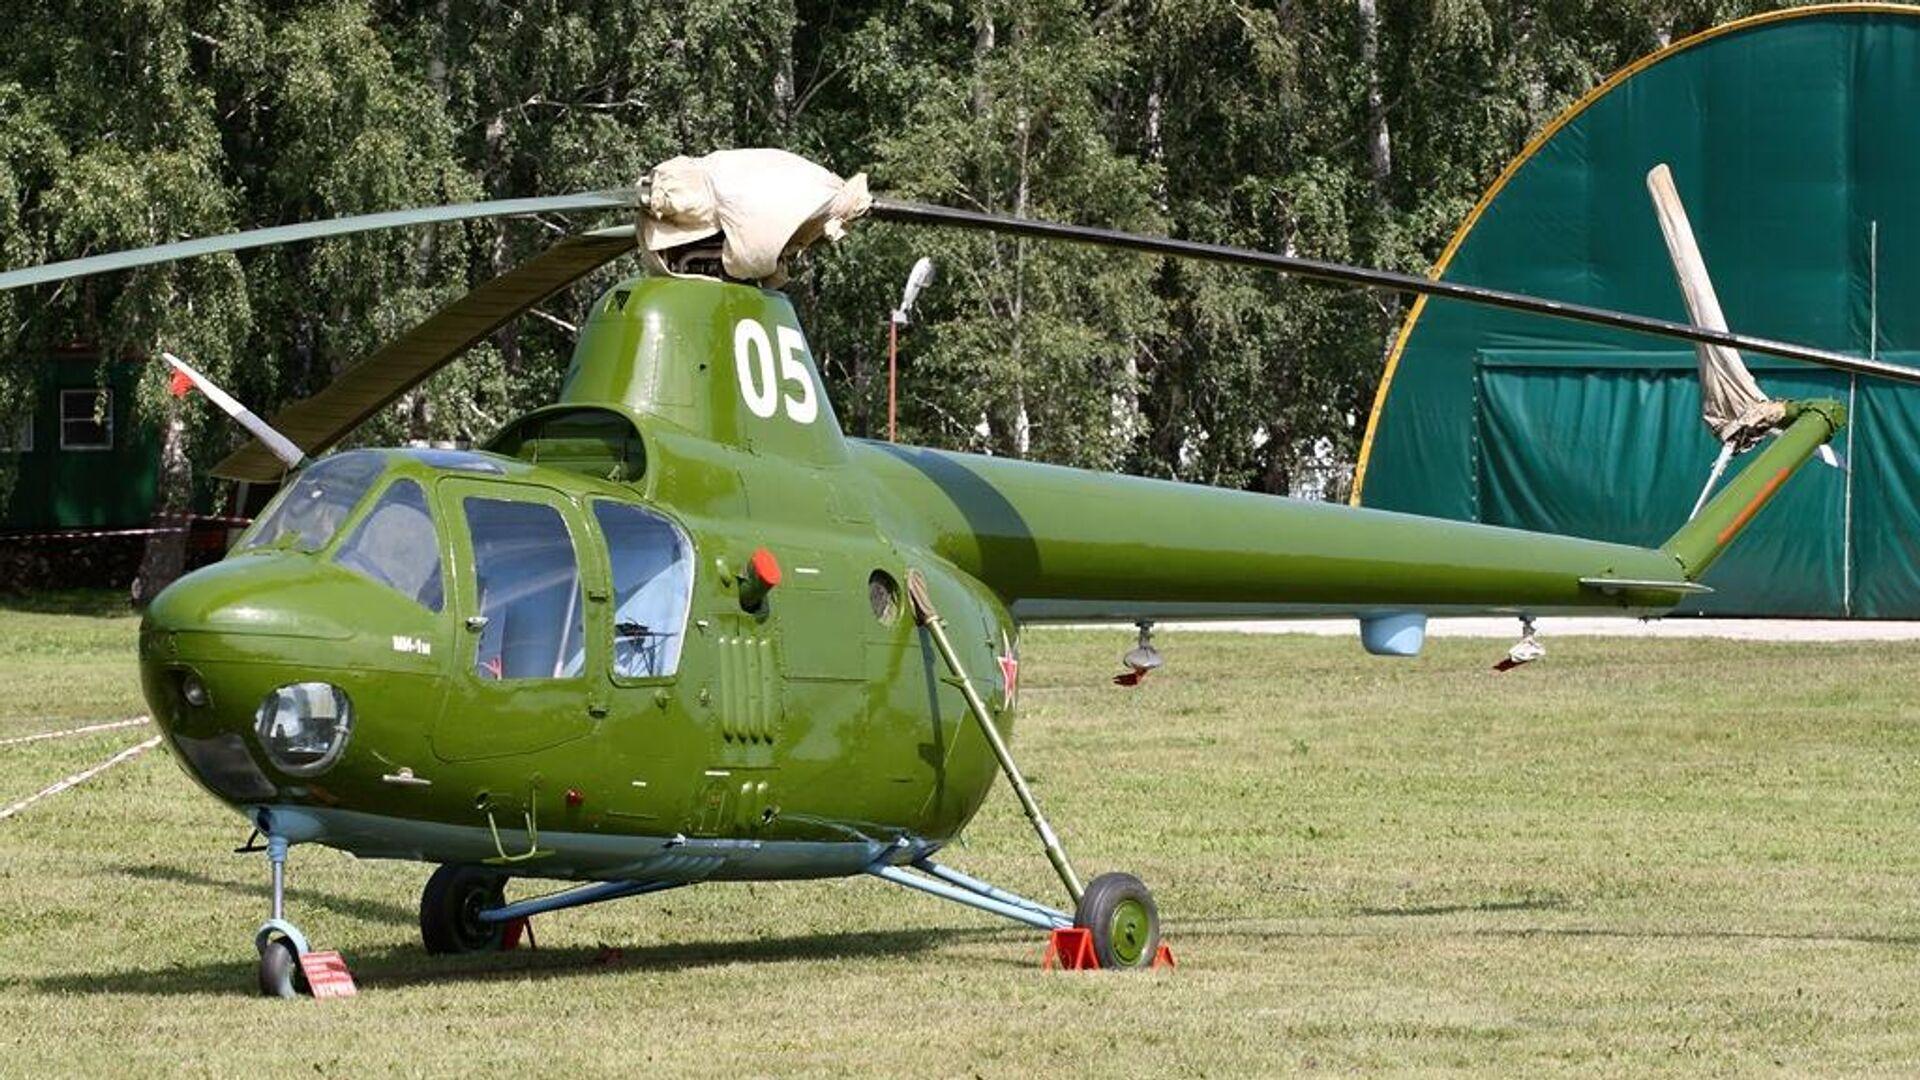 Un helicóptero Mi-1  - Sputnik Mundo, 1920, 31.05.2021